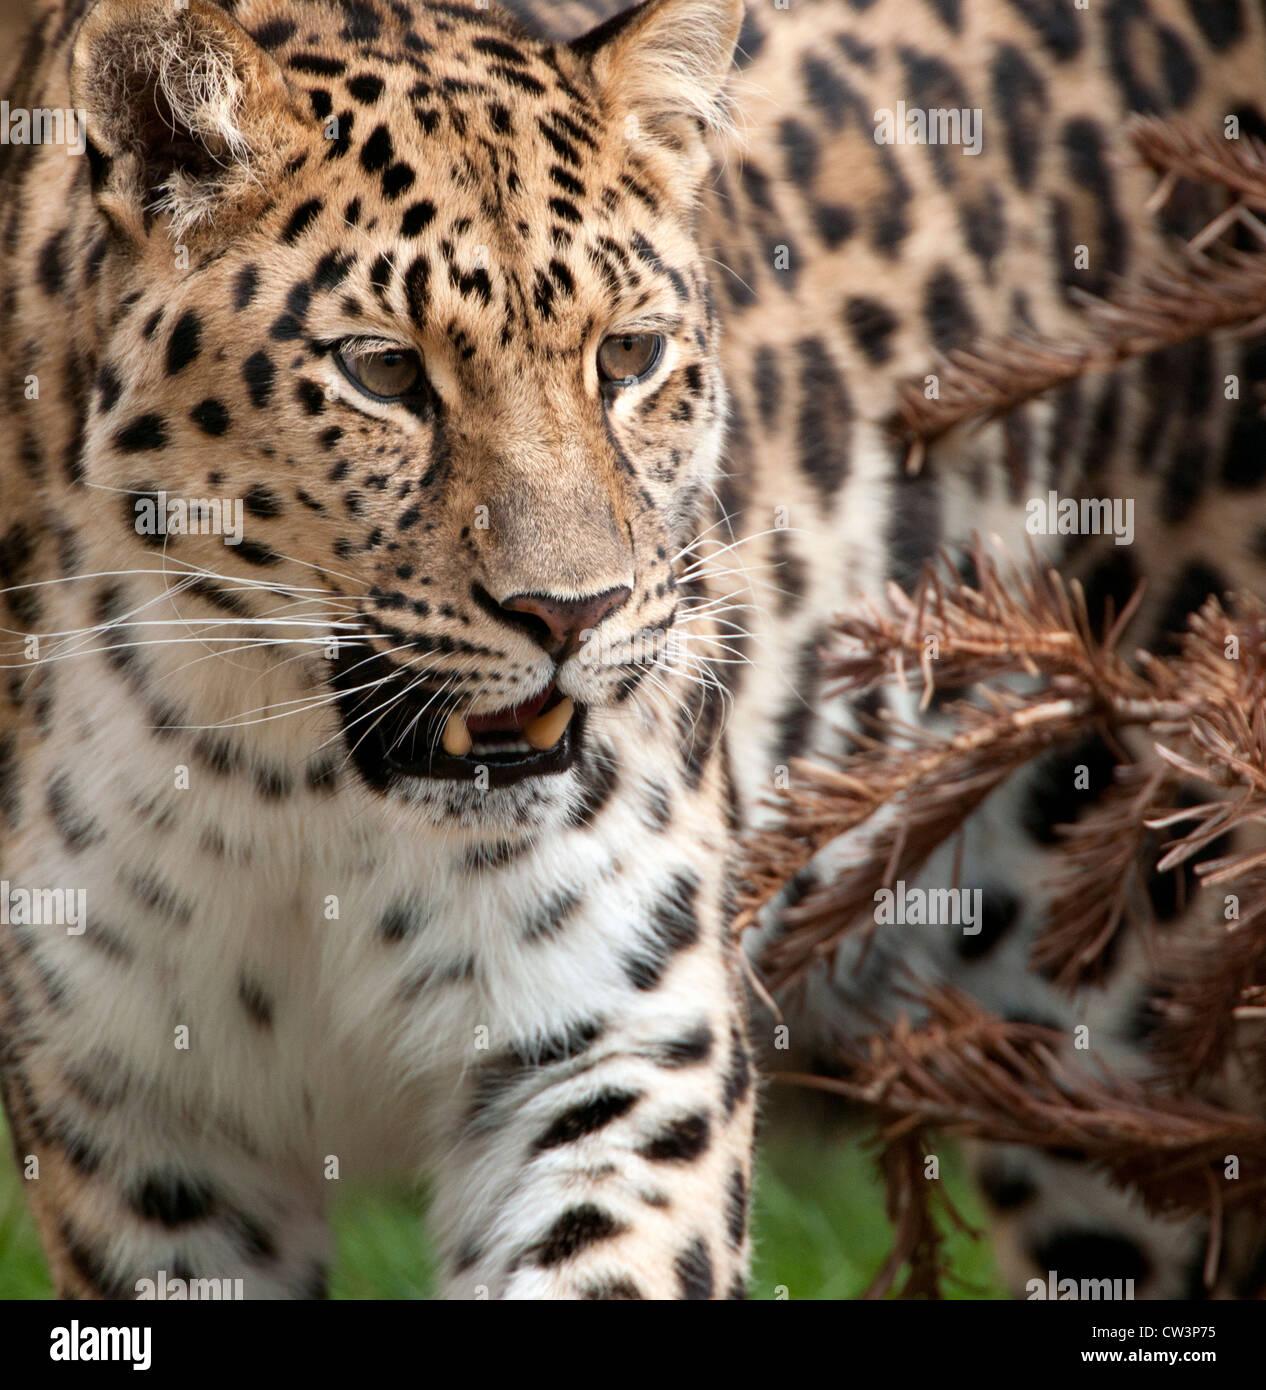 Female Amur leopard prowling - Stock Image